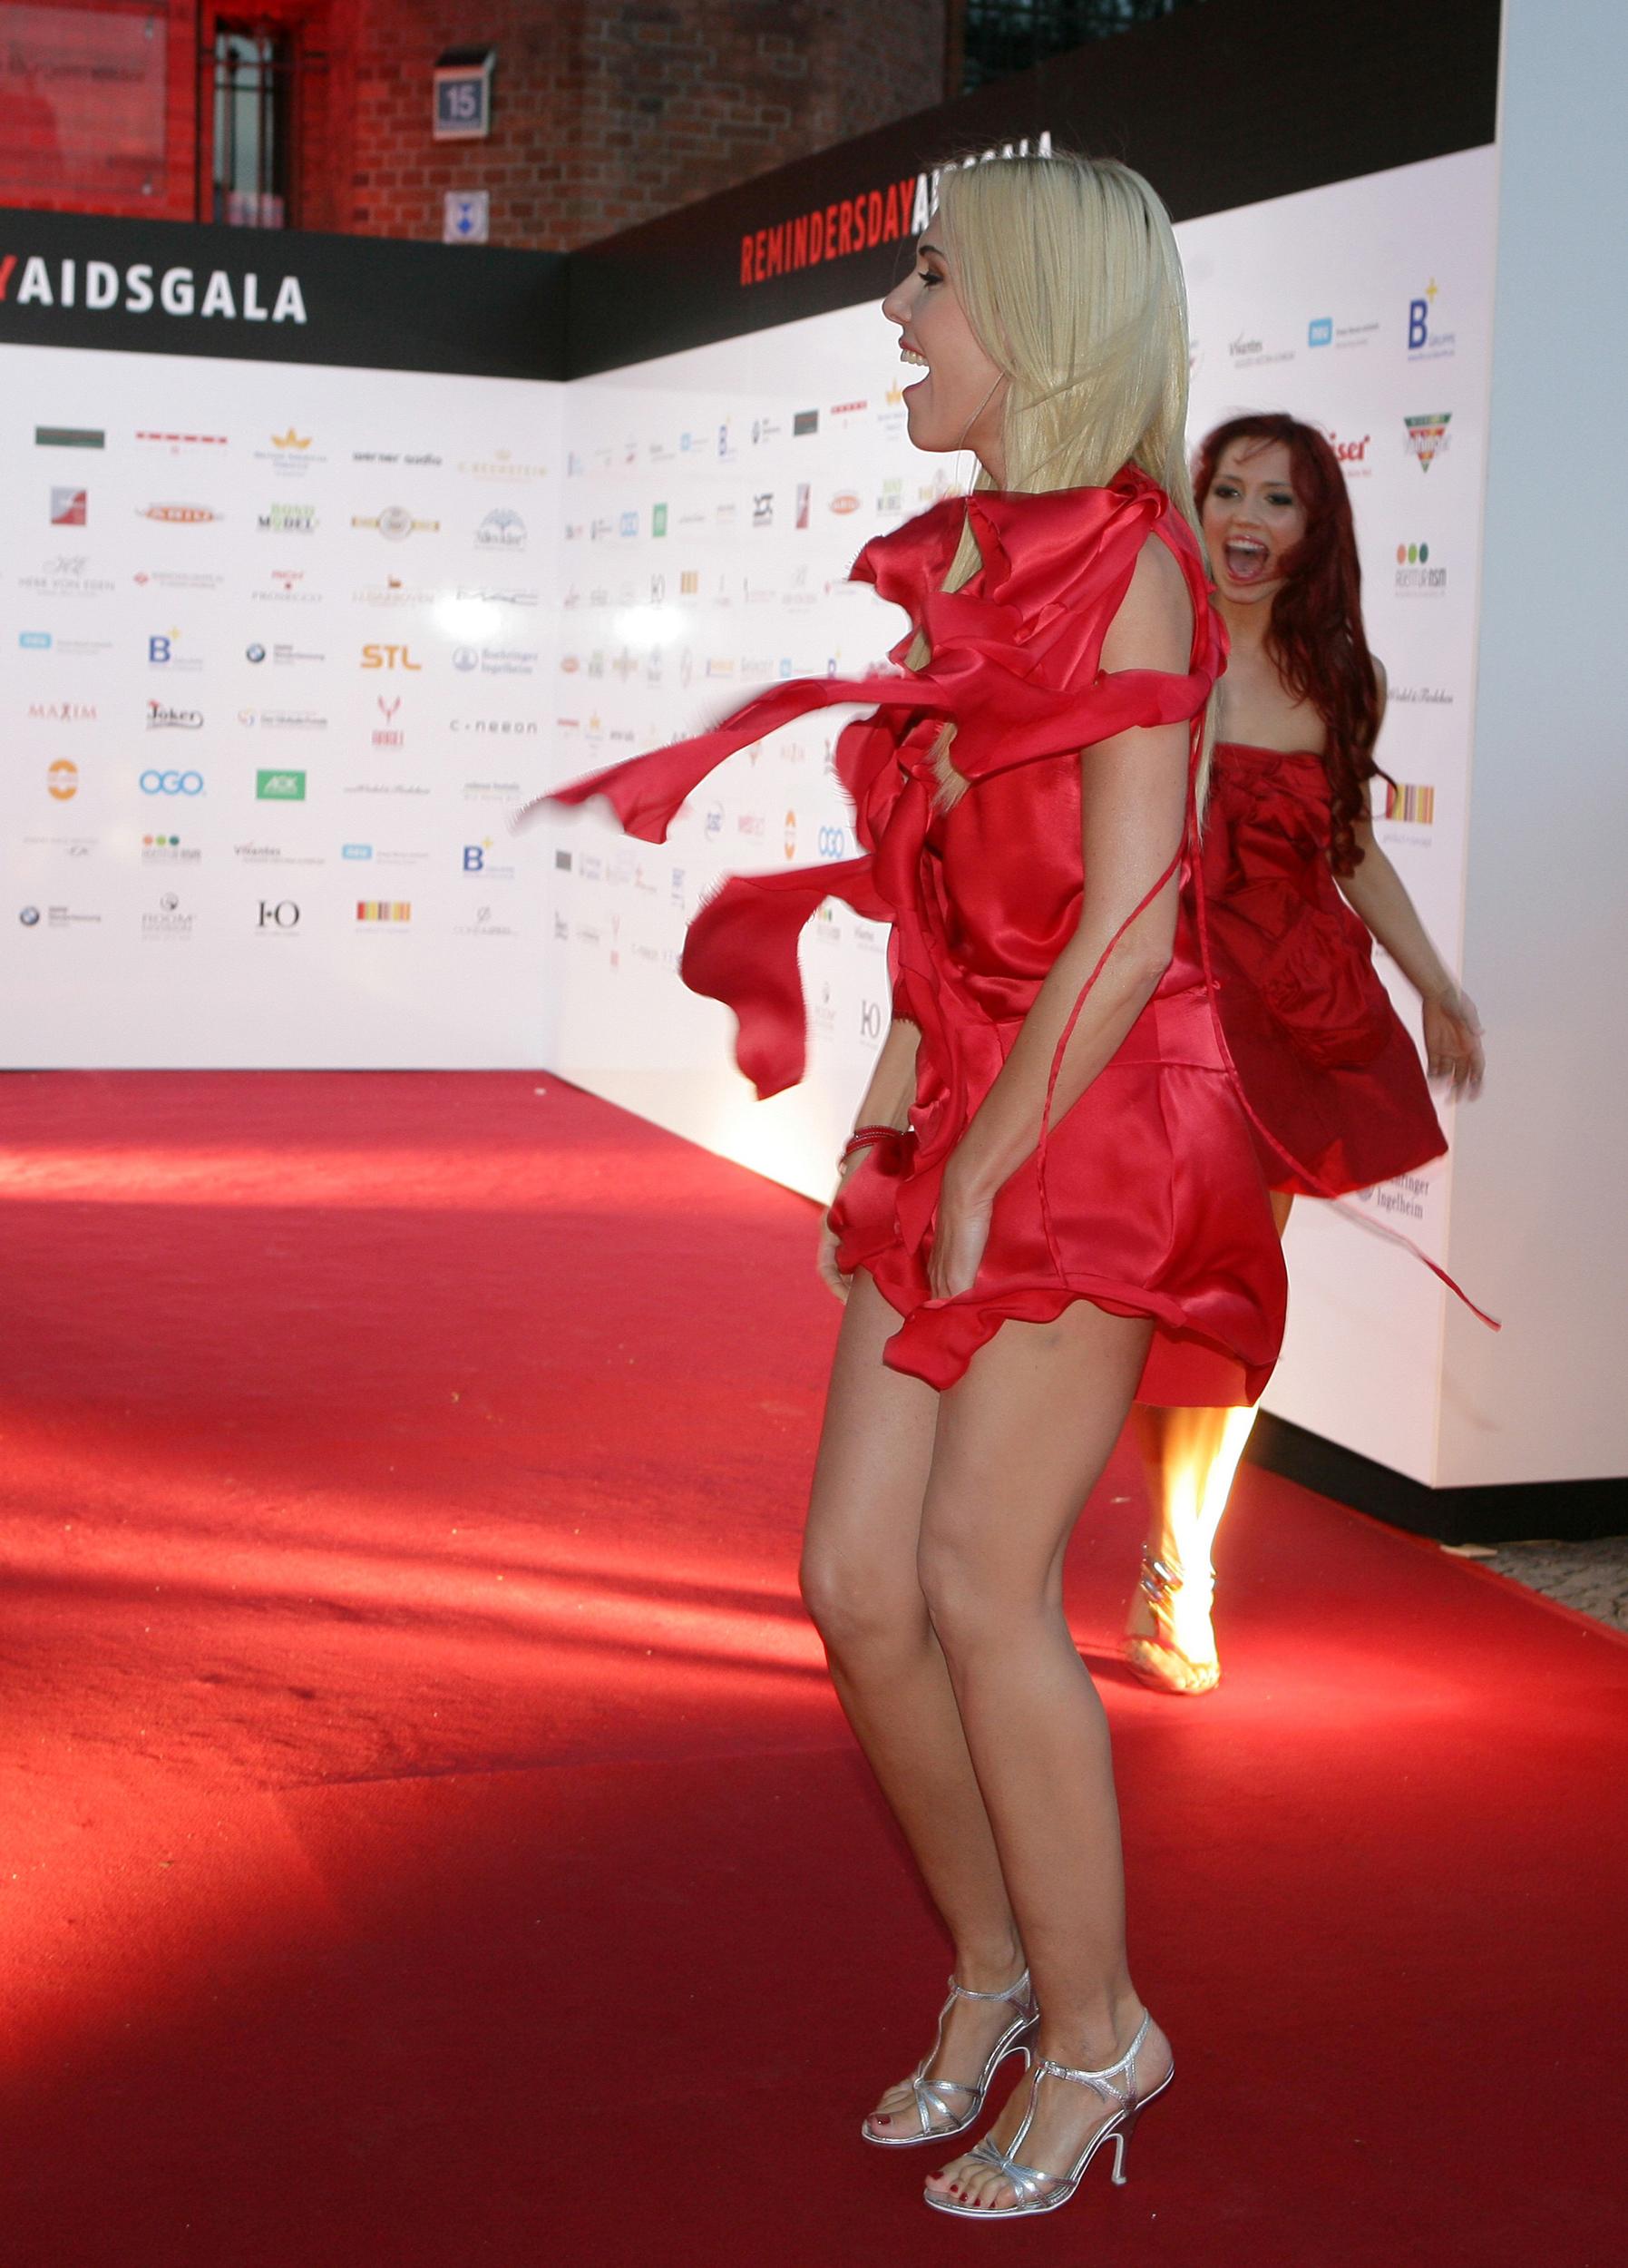 Video Alexandra Klim nude photos 2019